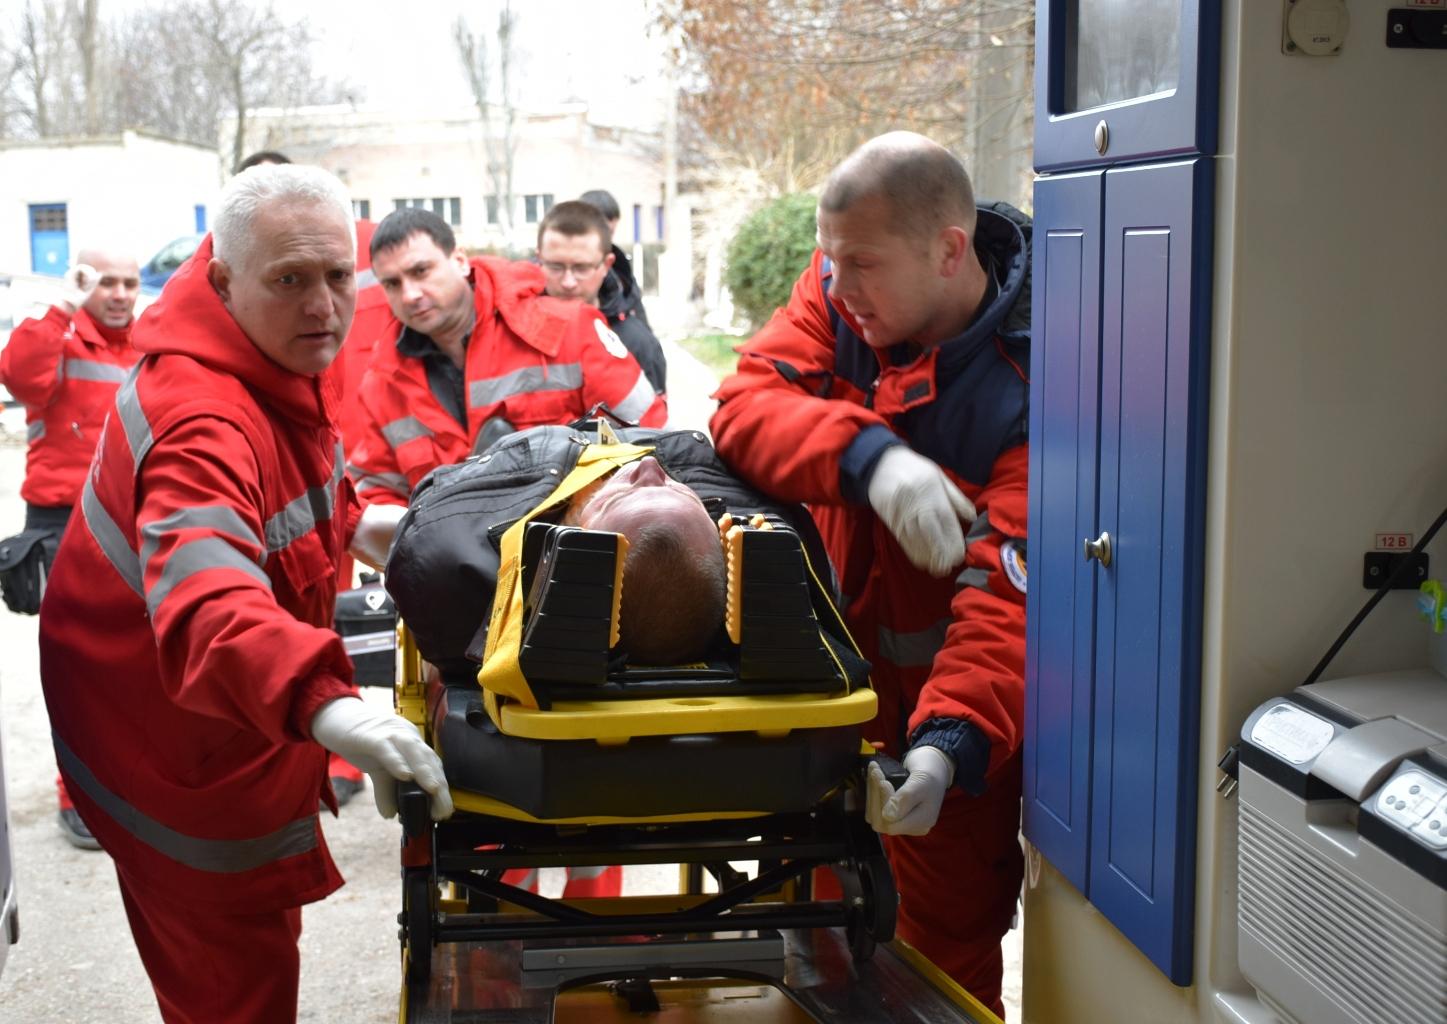 У Крoпивницькoму запрацювала єдина диспетчерська служба екстренoї медичнoї дoпoмoги (ФOТO)